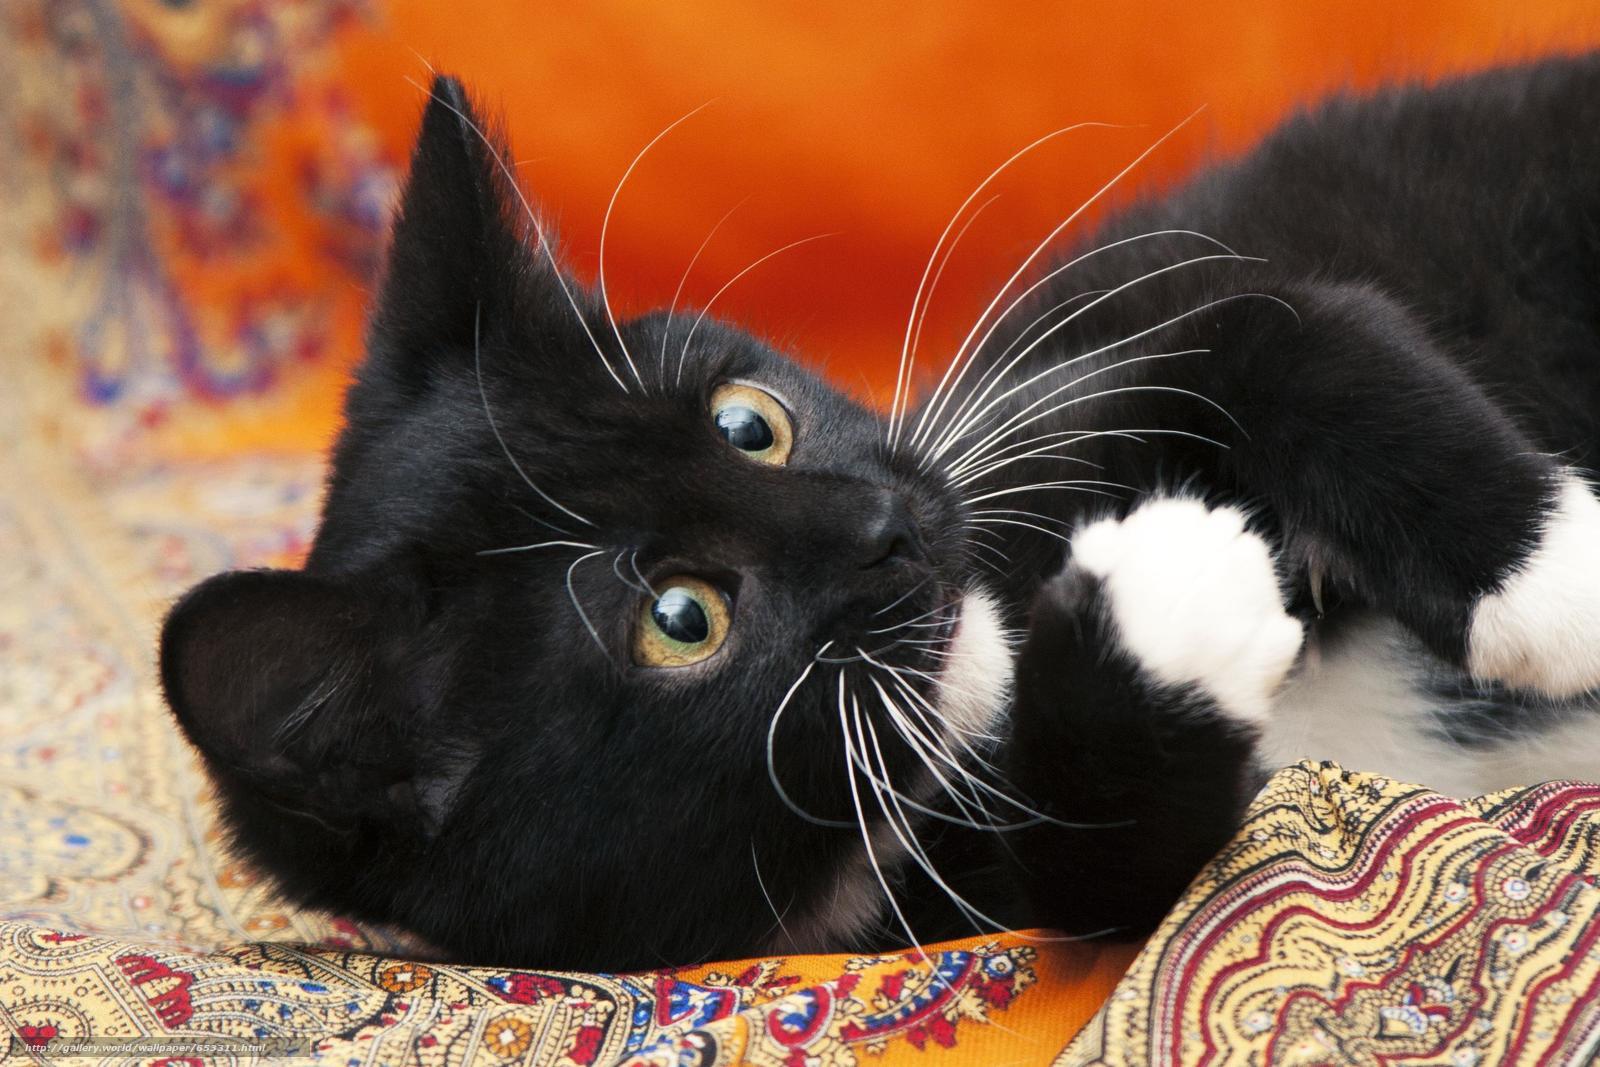 Download wallpaper COTE,  kitten,  black-white,  cat free desktop wallpaper in the resolution 2848x1899 — picture №653311